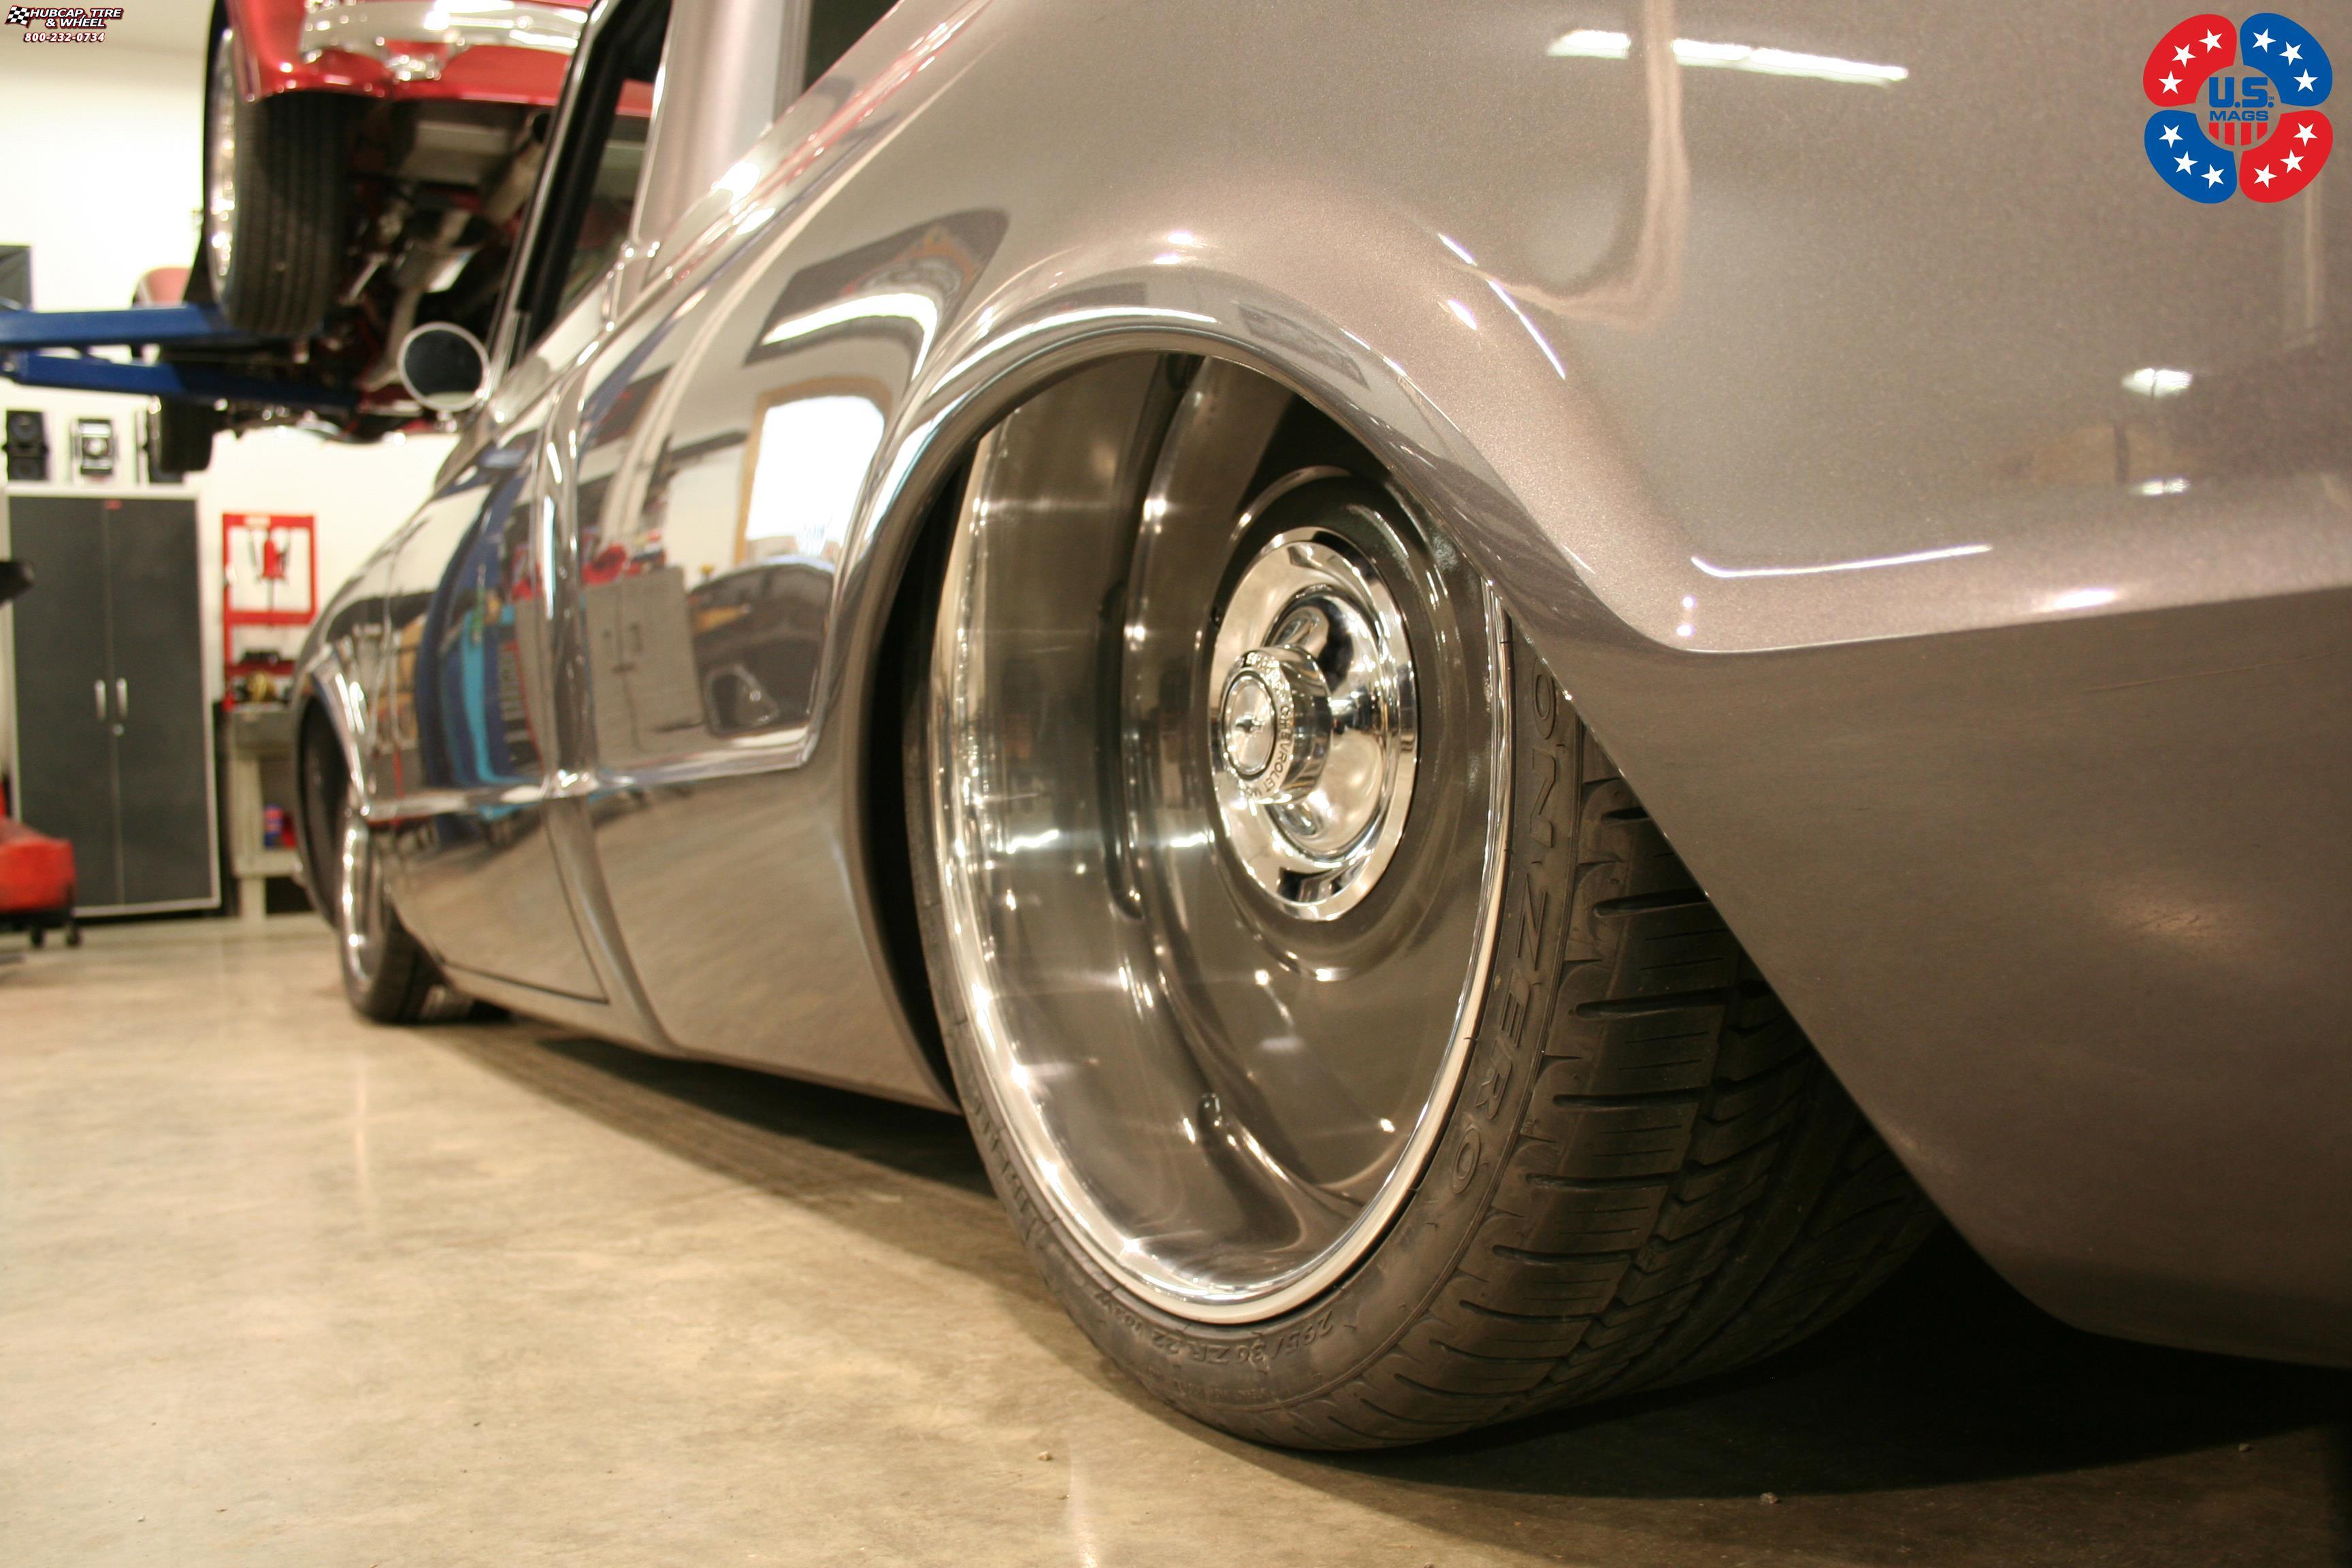 Amazoncom 2015 Chevy Malibu spare tire